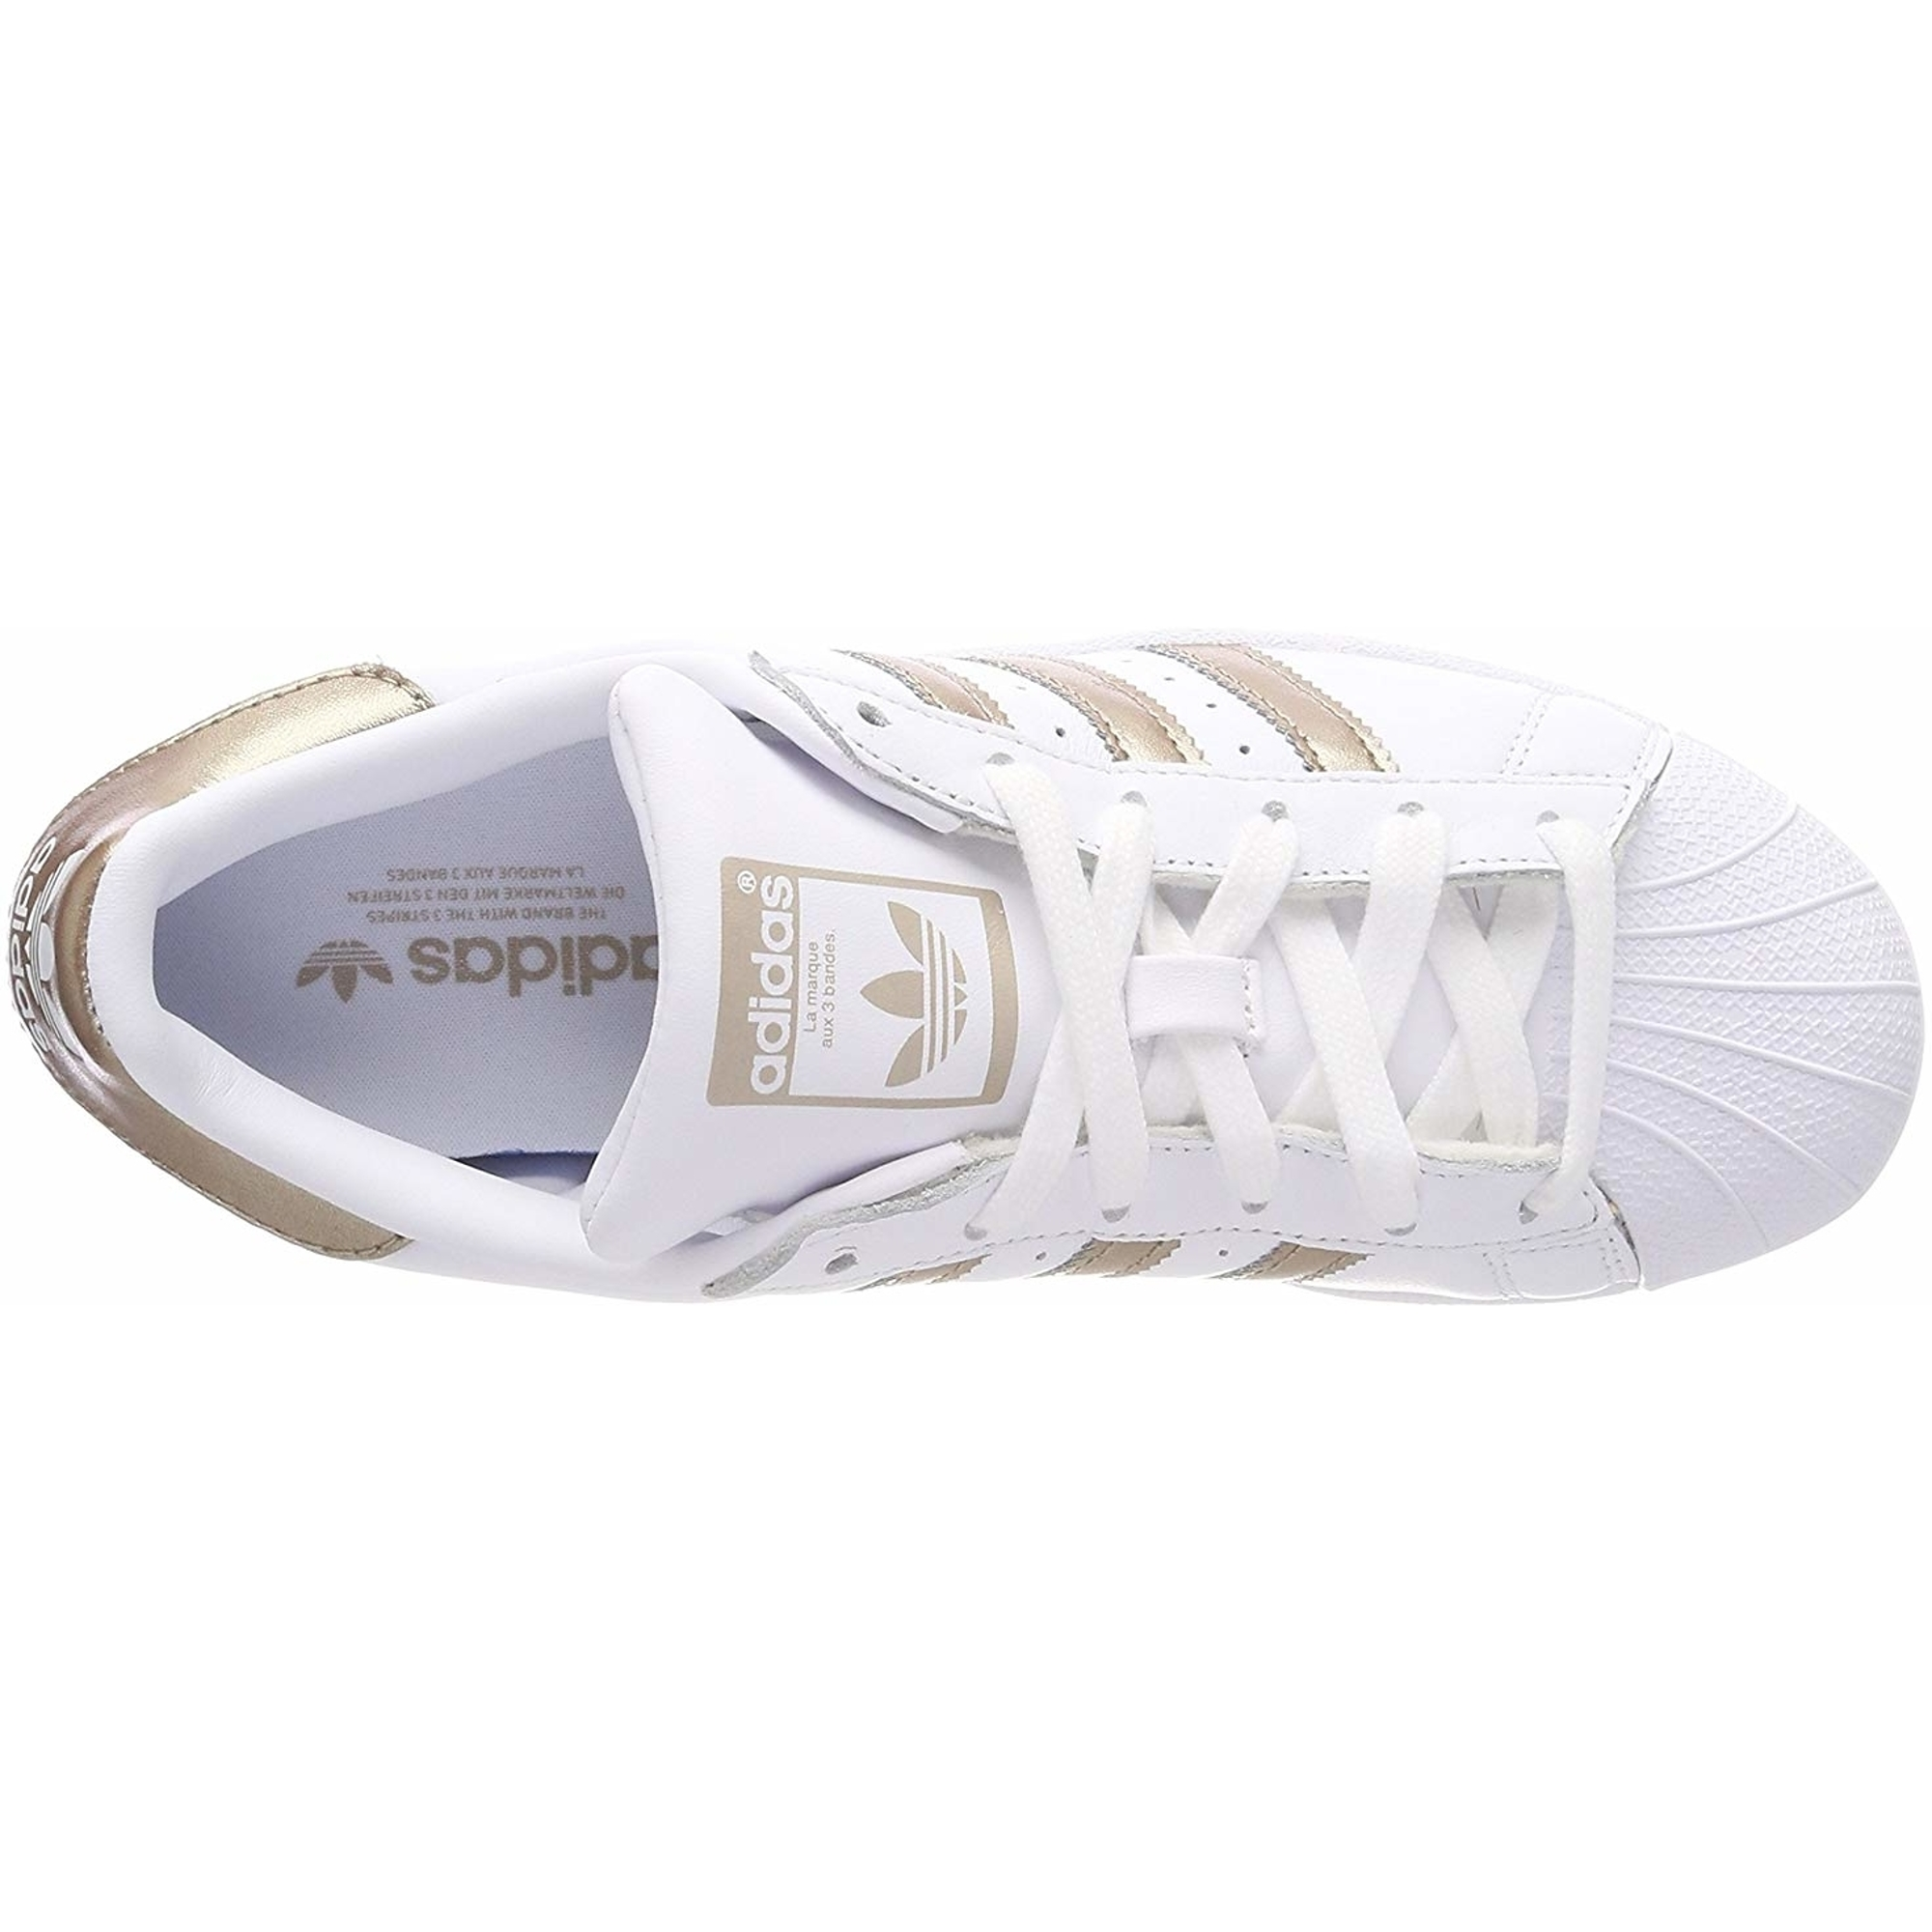 Adidas Originals Superstar Damen Schuhe Ftwr WeißCyber